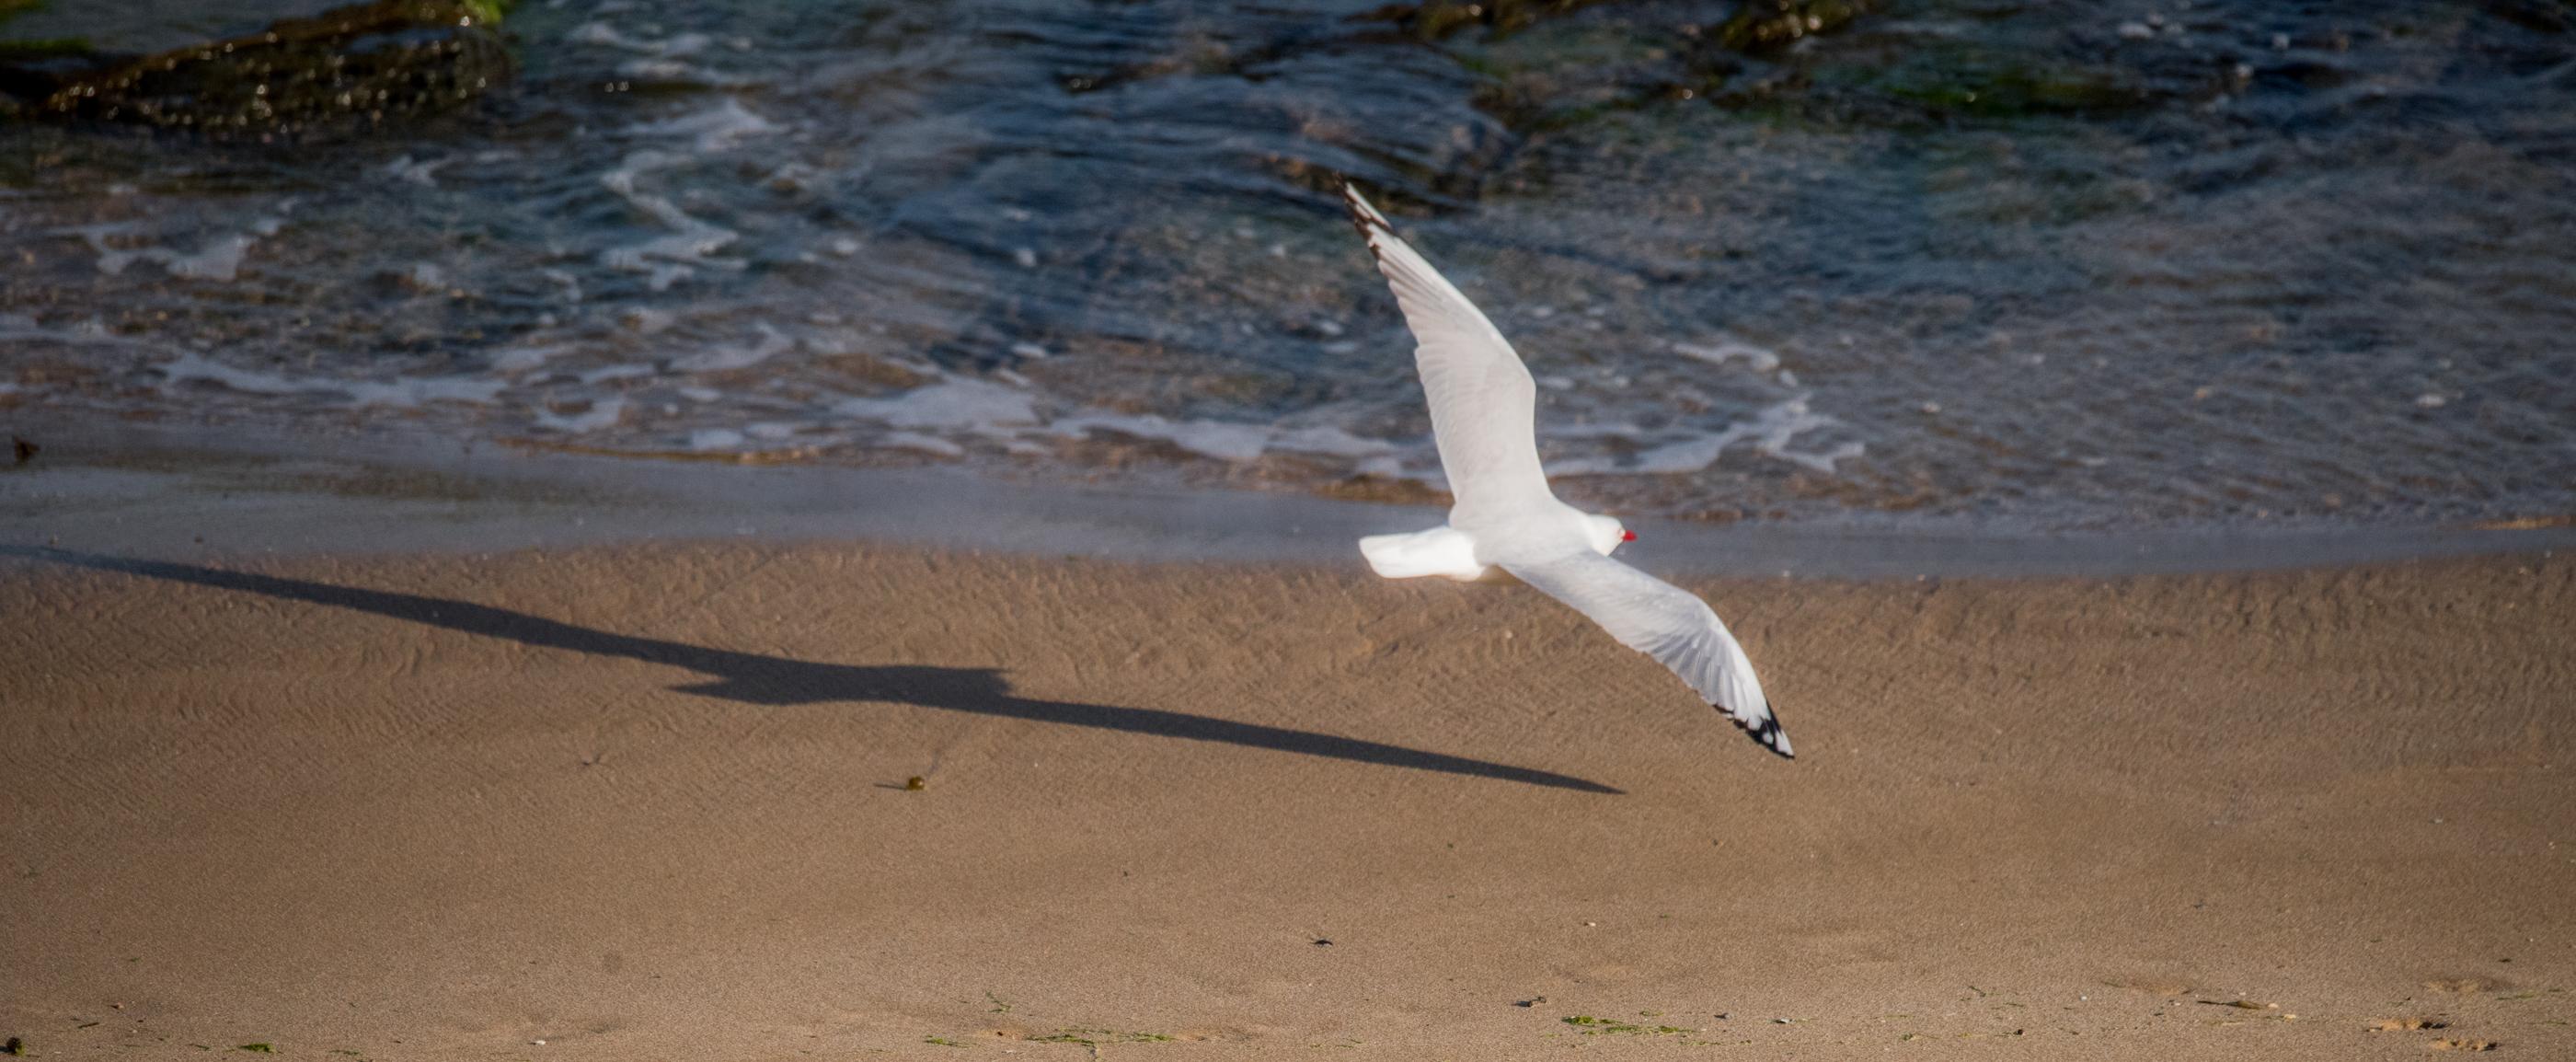 Seagull landing on beach